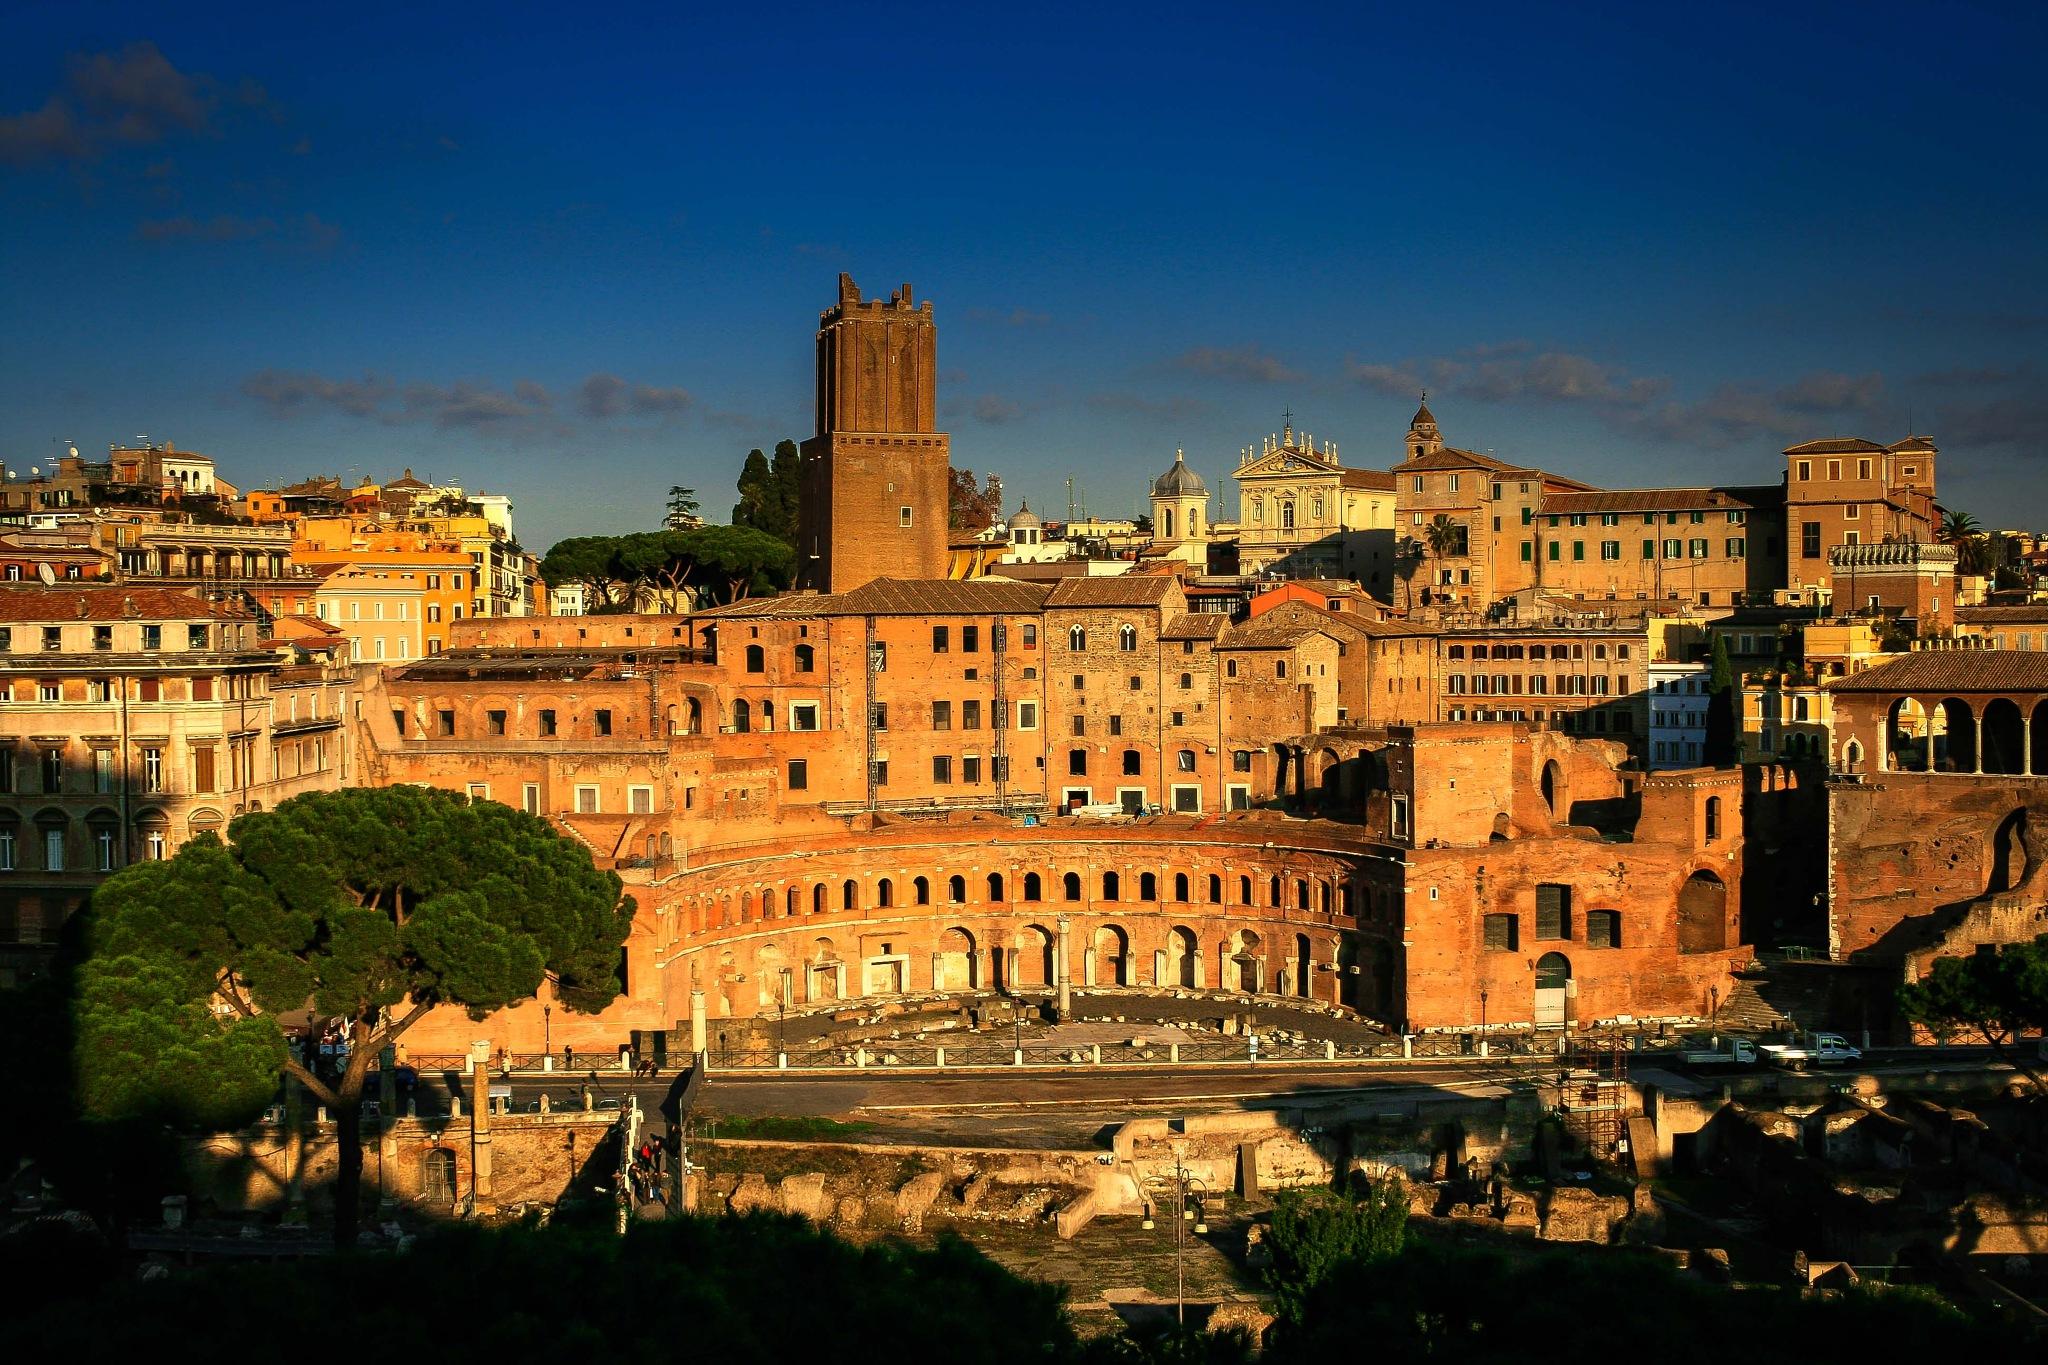 Trajan's Market. by billymcwilliams